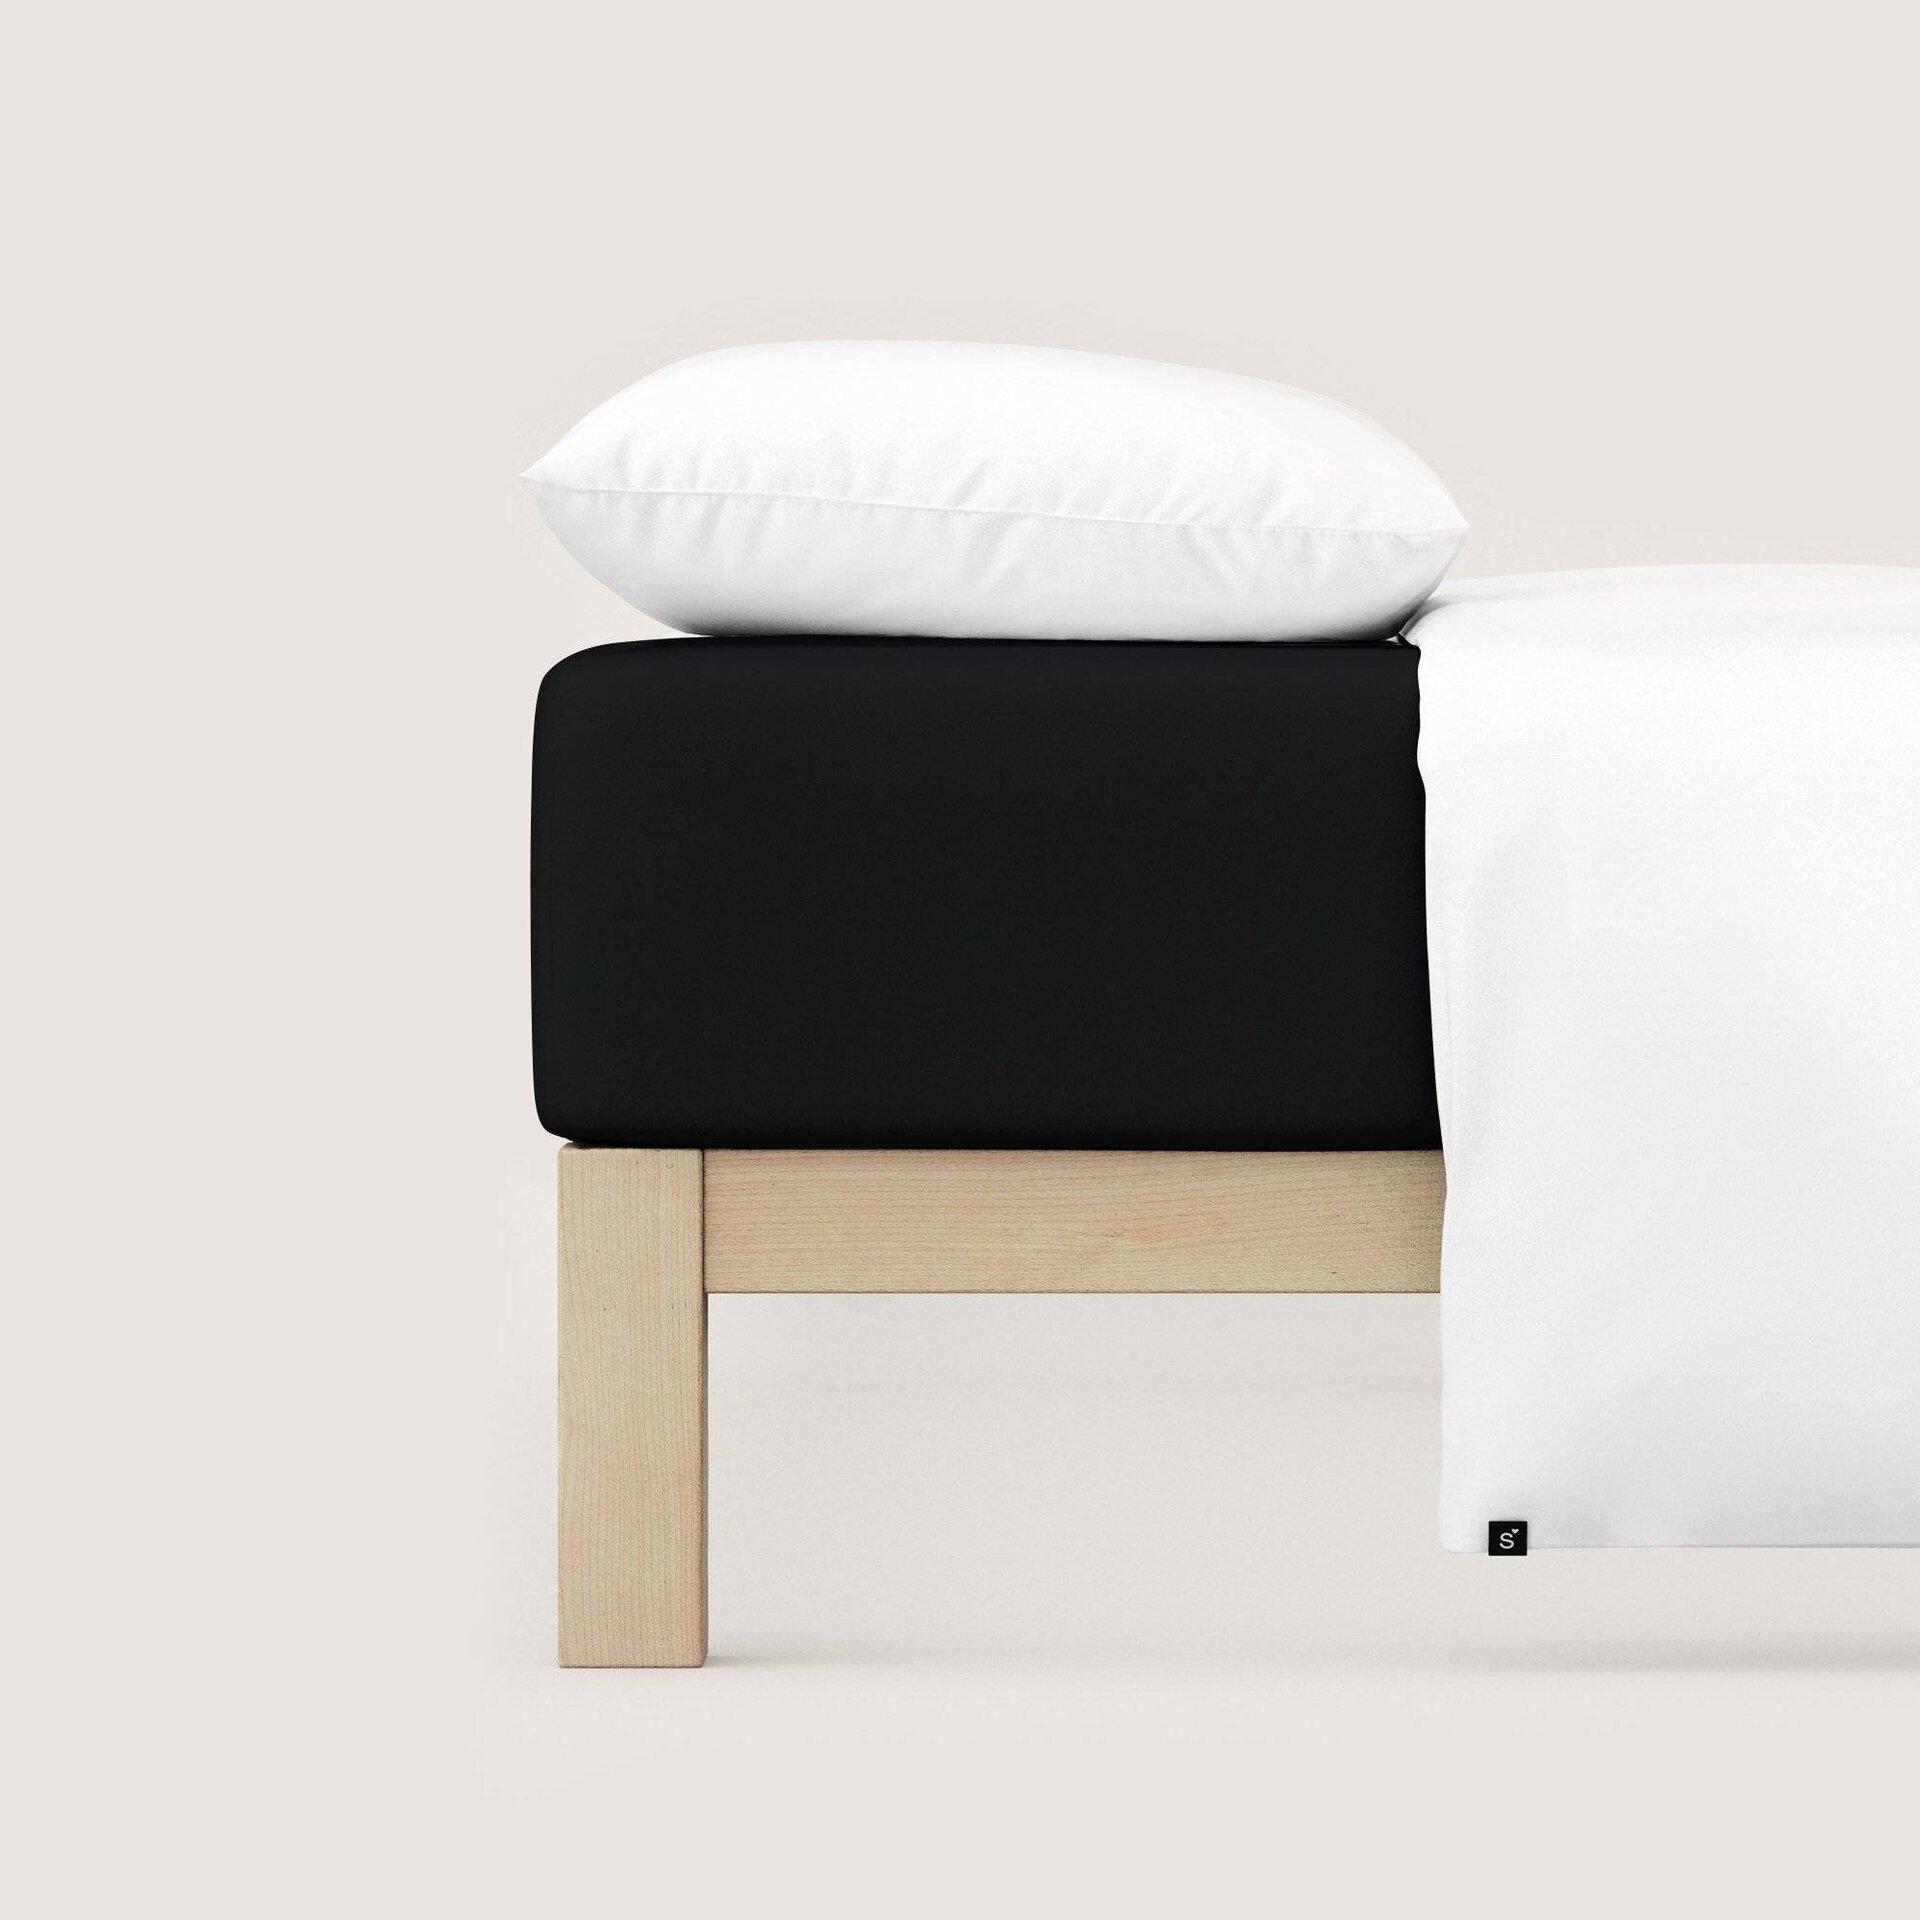 Jersey-Spannbetttuch Schlafgut Textil 120 x 200 cm